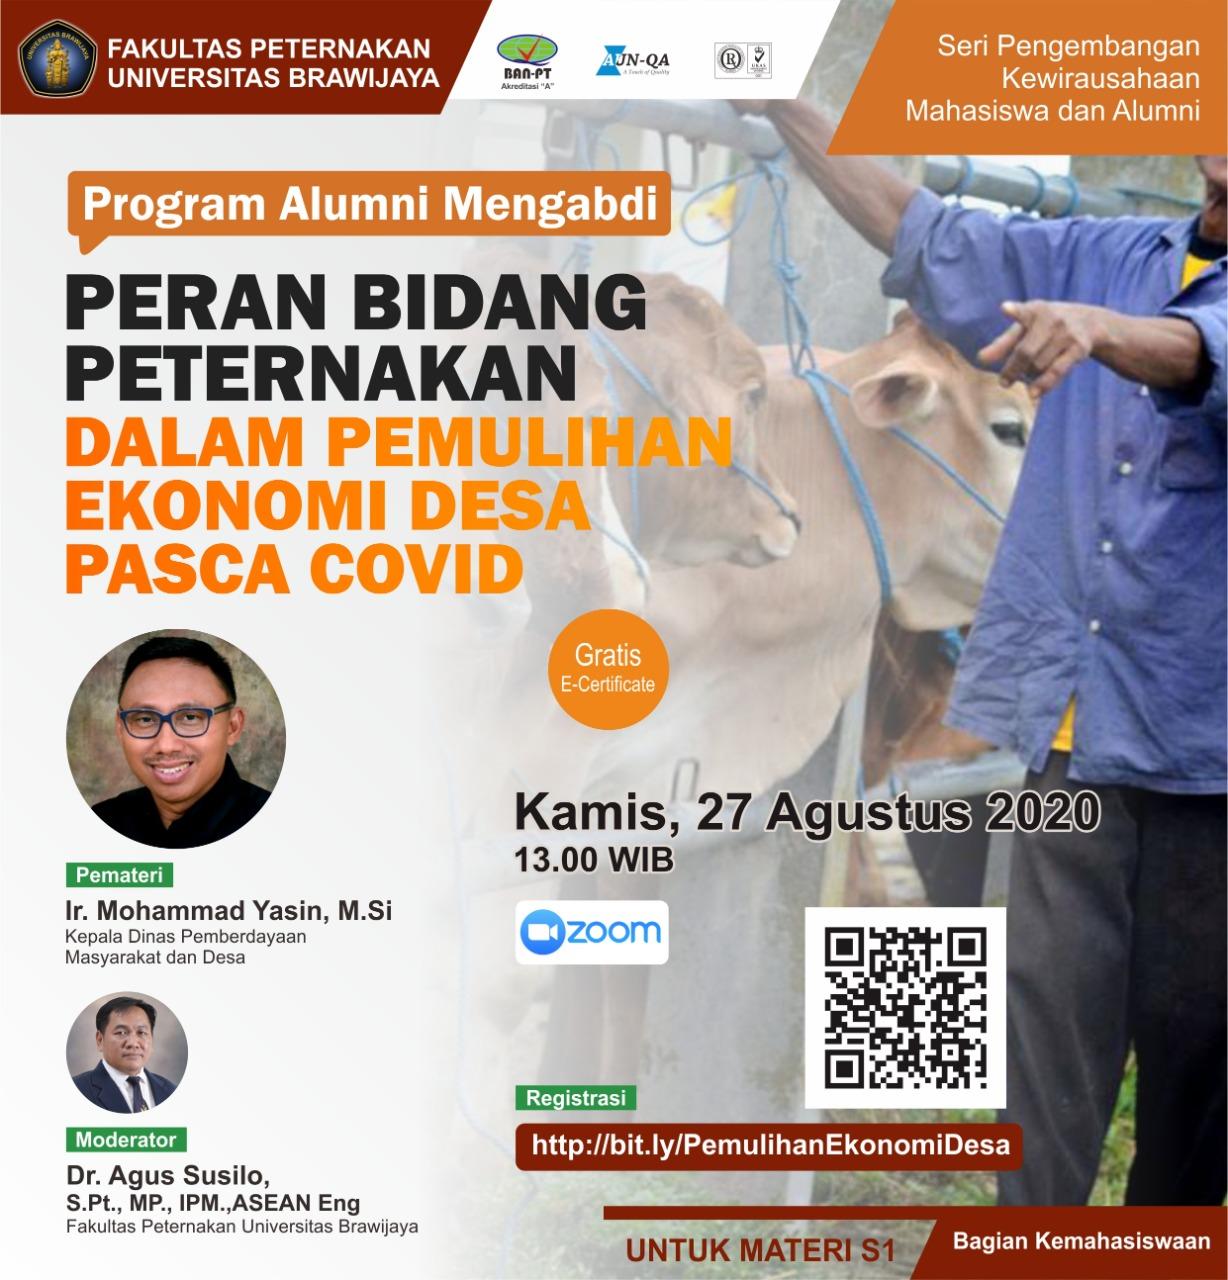 Seminar Online Peran Bidang Peternakan dalam Pemulihan Ekonomi Desa Pasca Covid